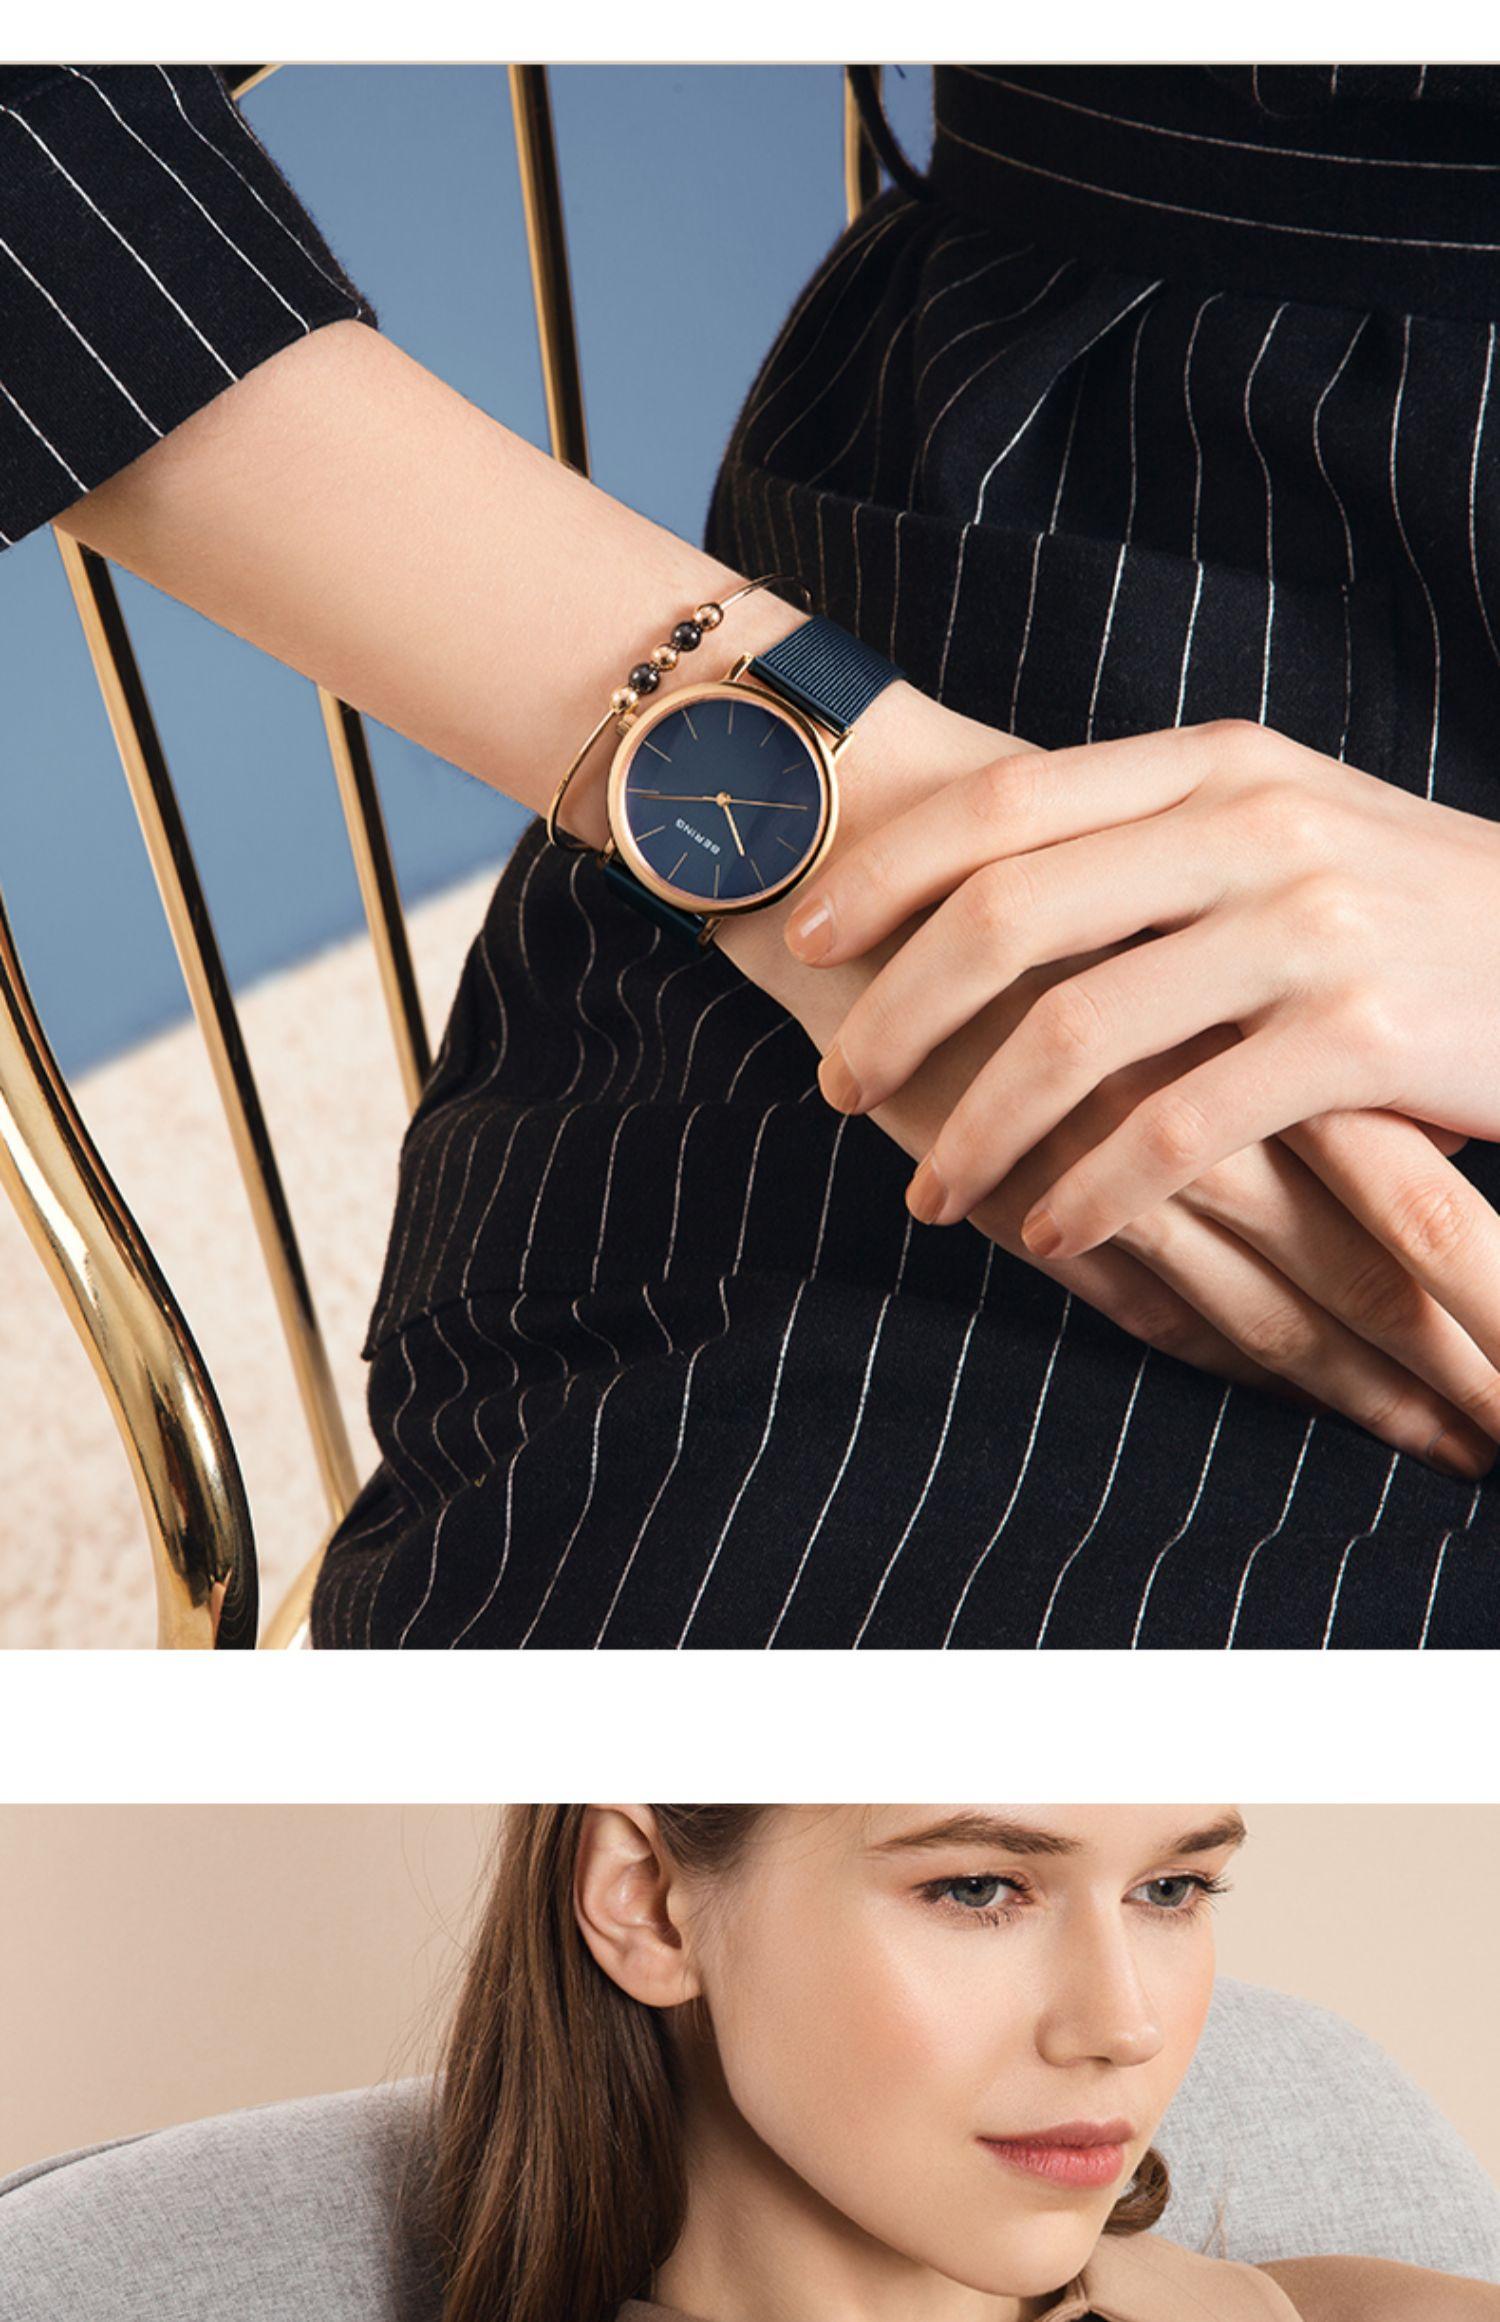 bering手表女正品名牌时尚女表2020新款女士手表品牌白令手表女商品详情图